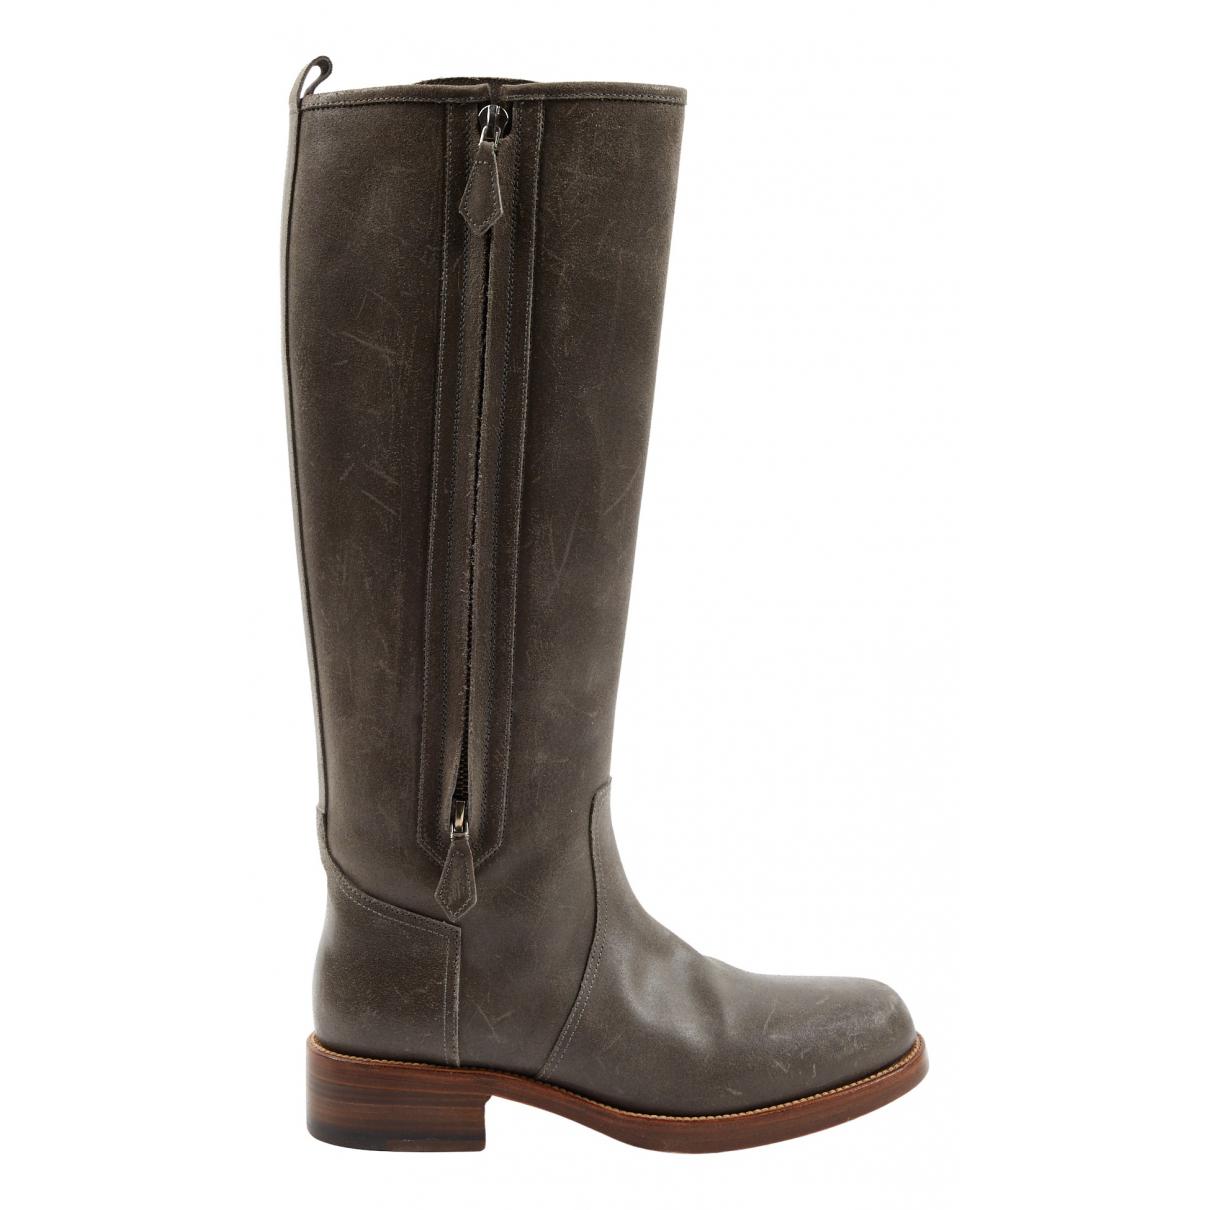 Hermès N Grey Leather Boots for Women 37 EU